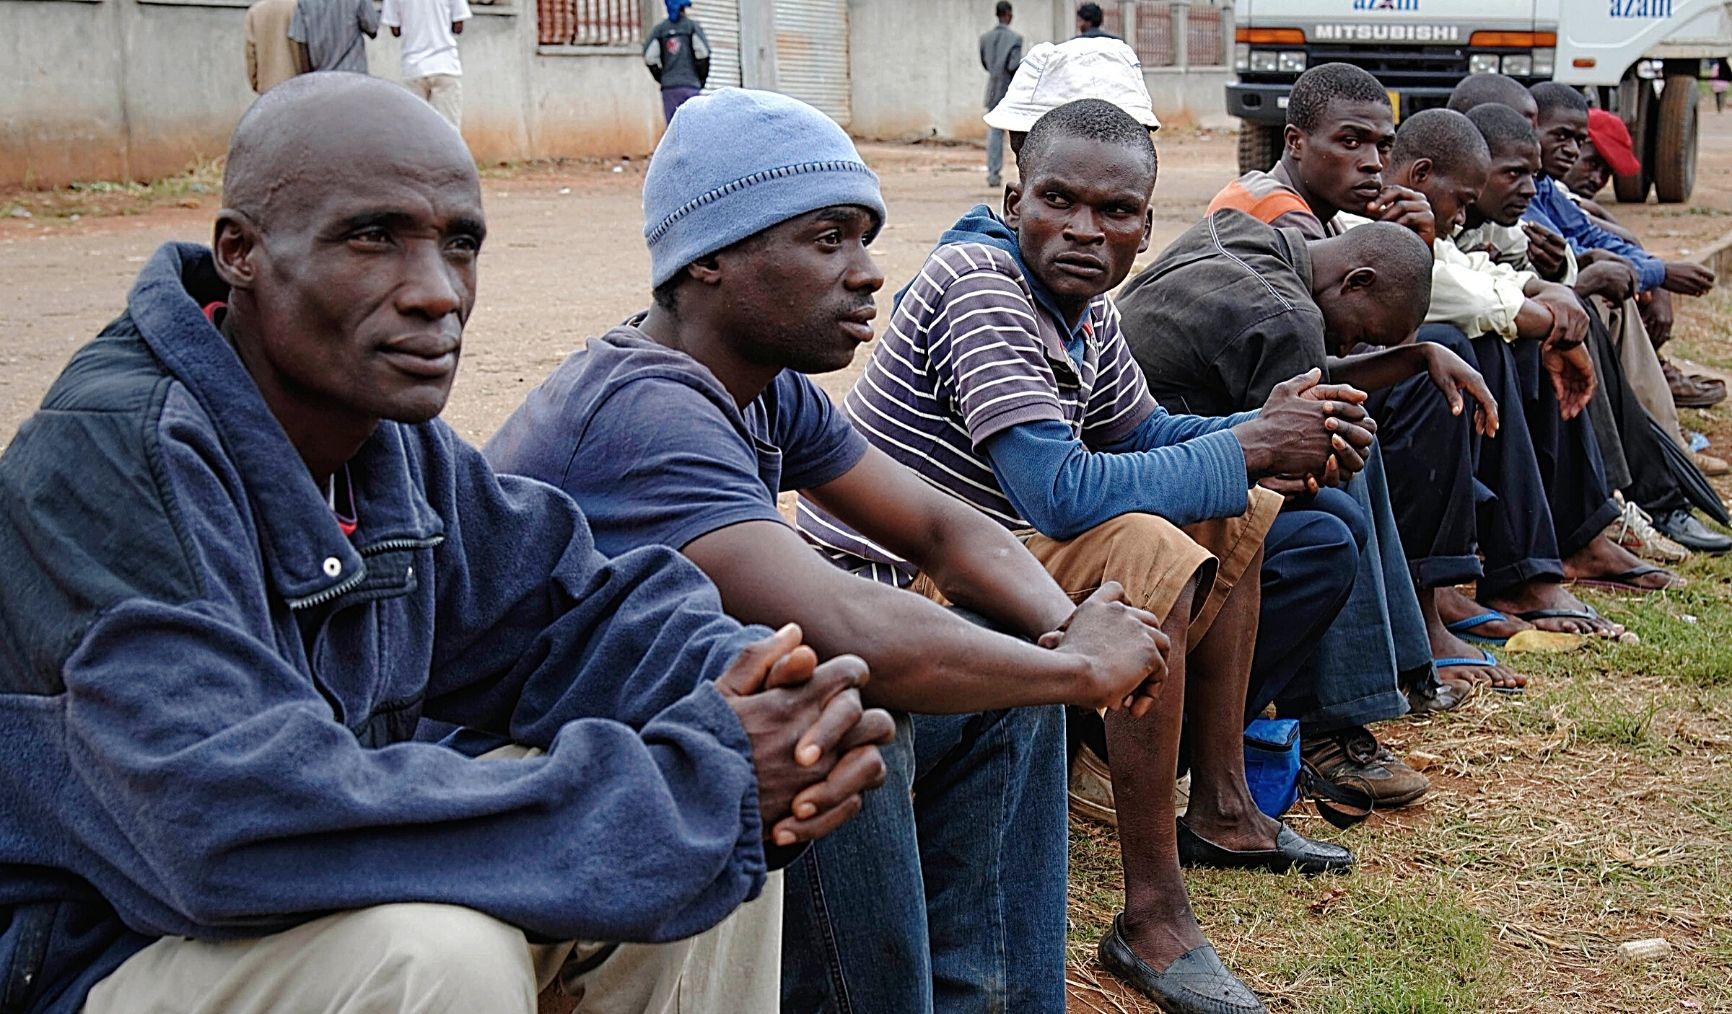 Nigeria's youth unemployment problem